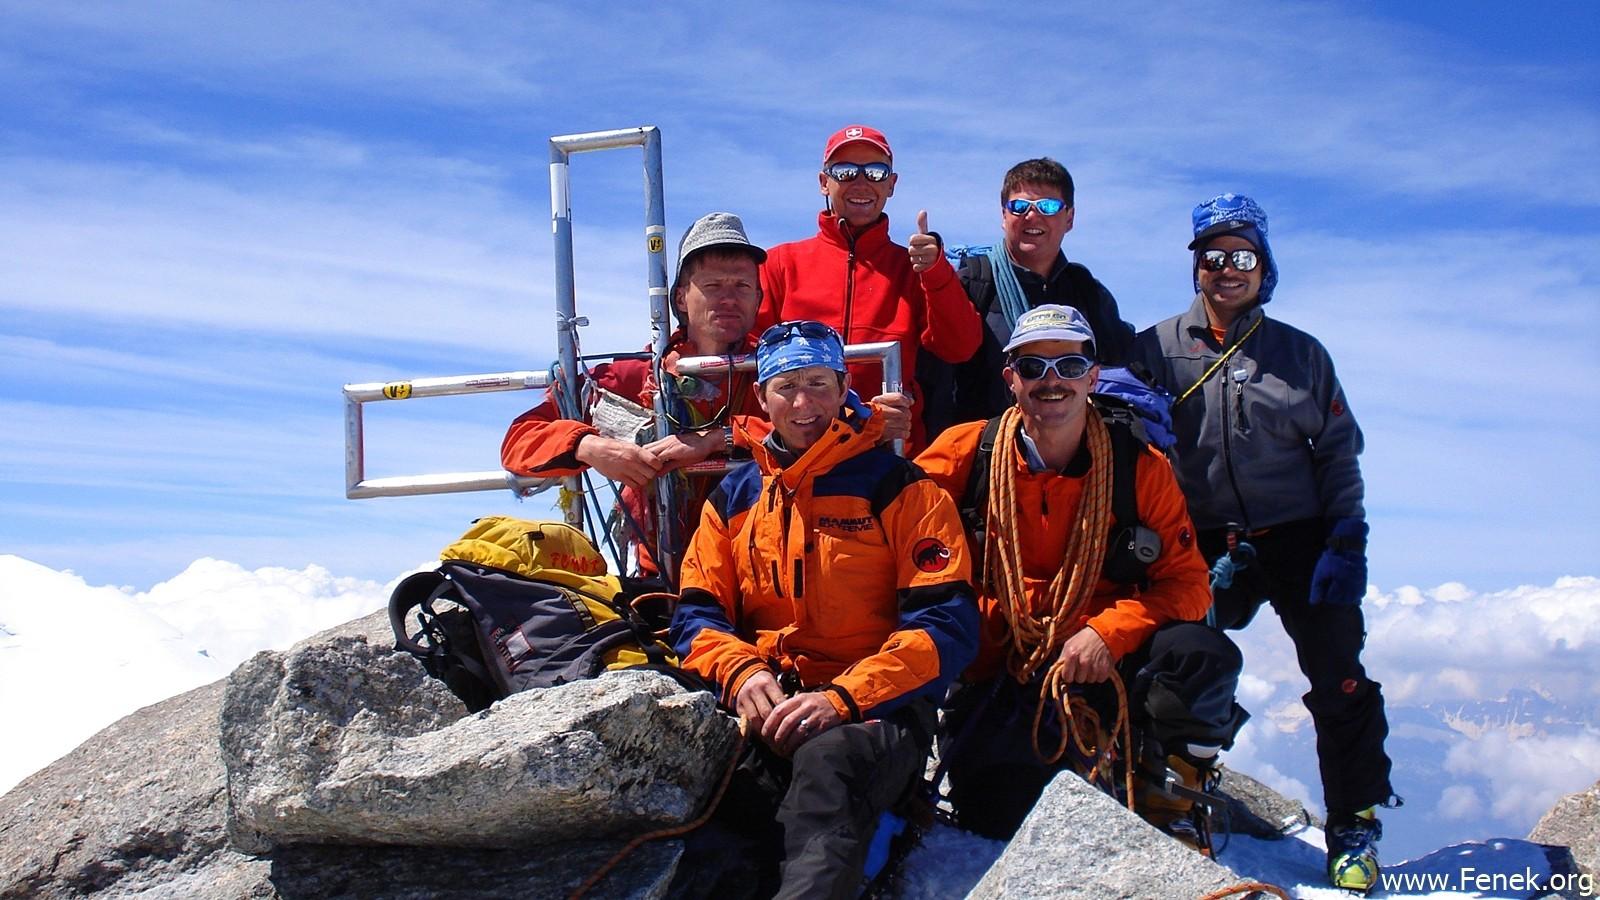 Gipfelfreude auf dem Mont Blanc du Tacul